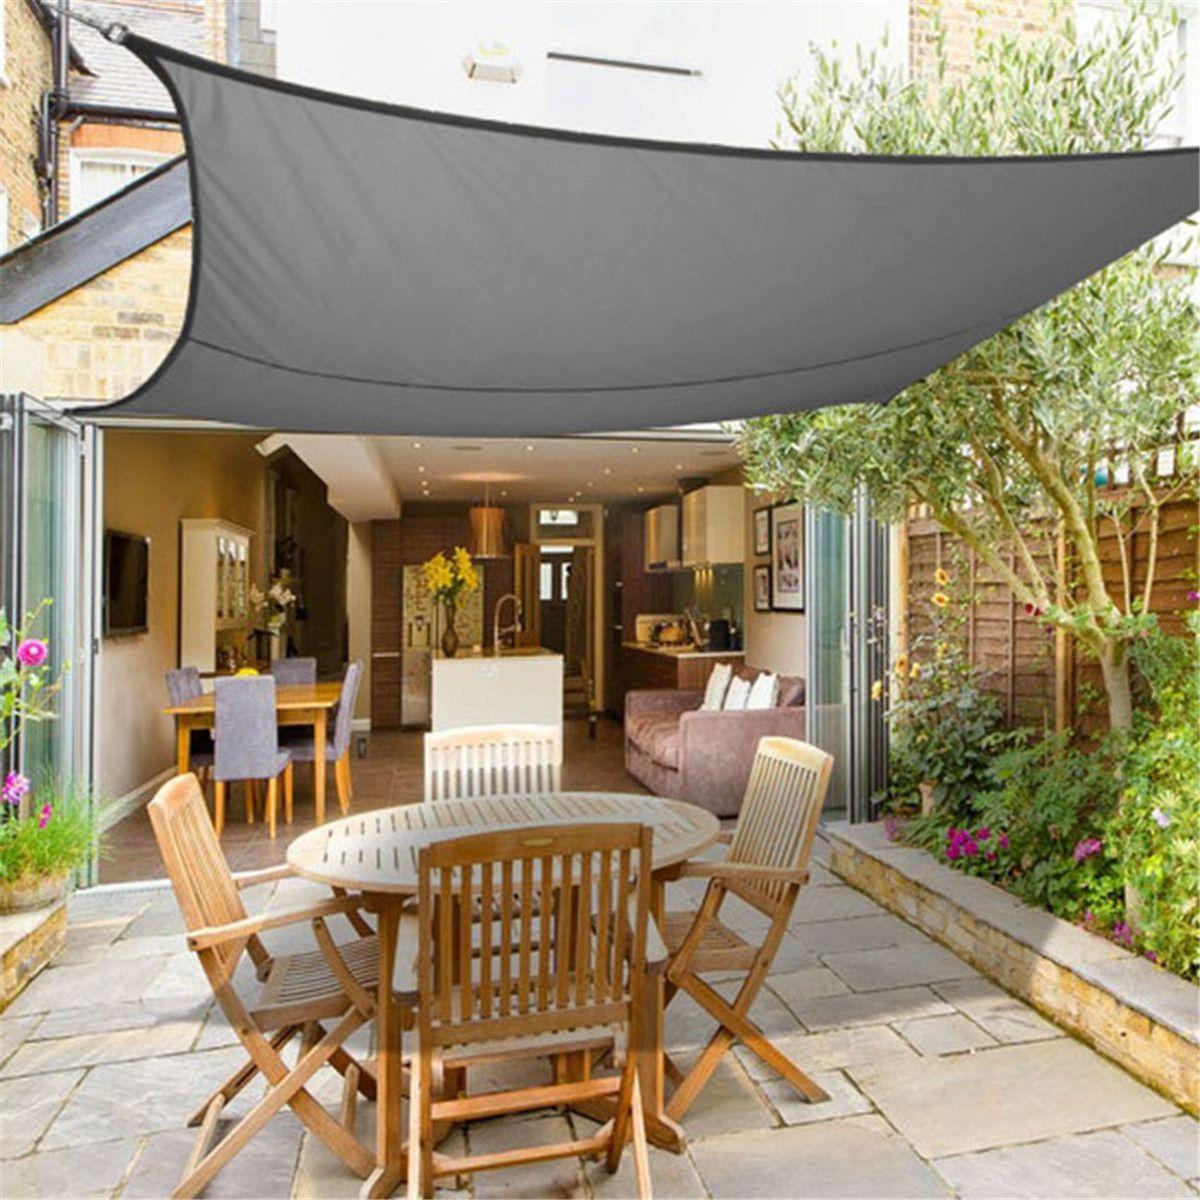 Waterproof Sun Shade Sail Garden Canopy Awning Screen 98% UV Block Sunshade Cloth Patio Garden Accessories Supplies 3mx2m